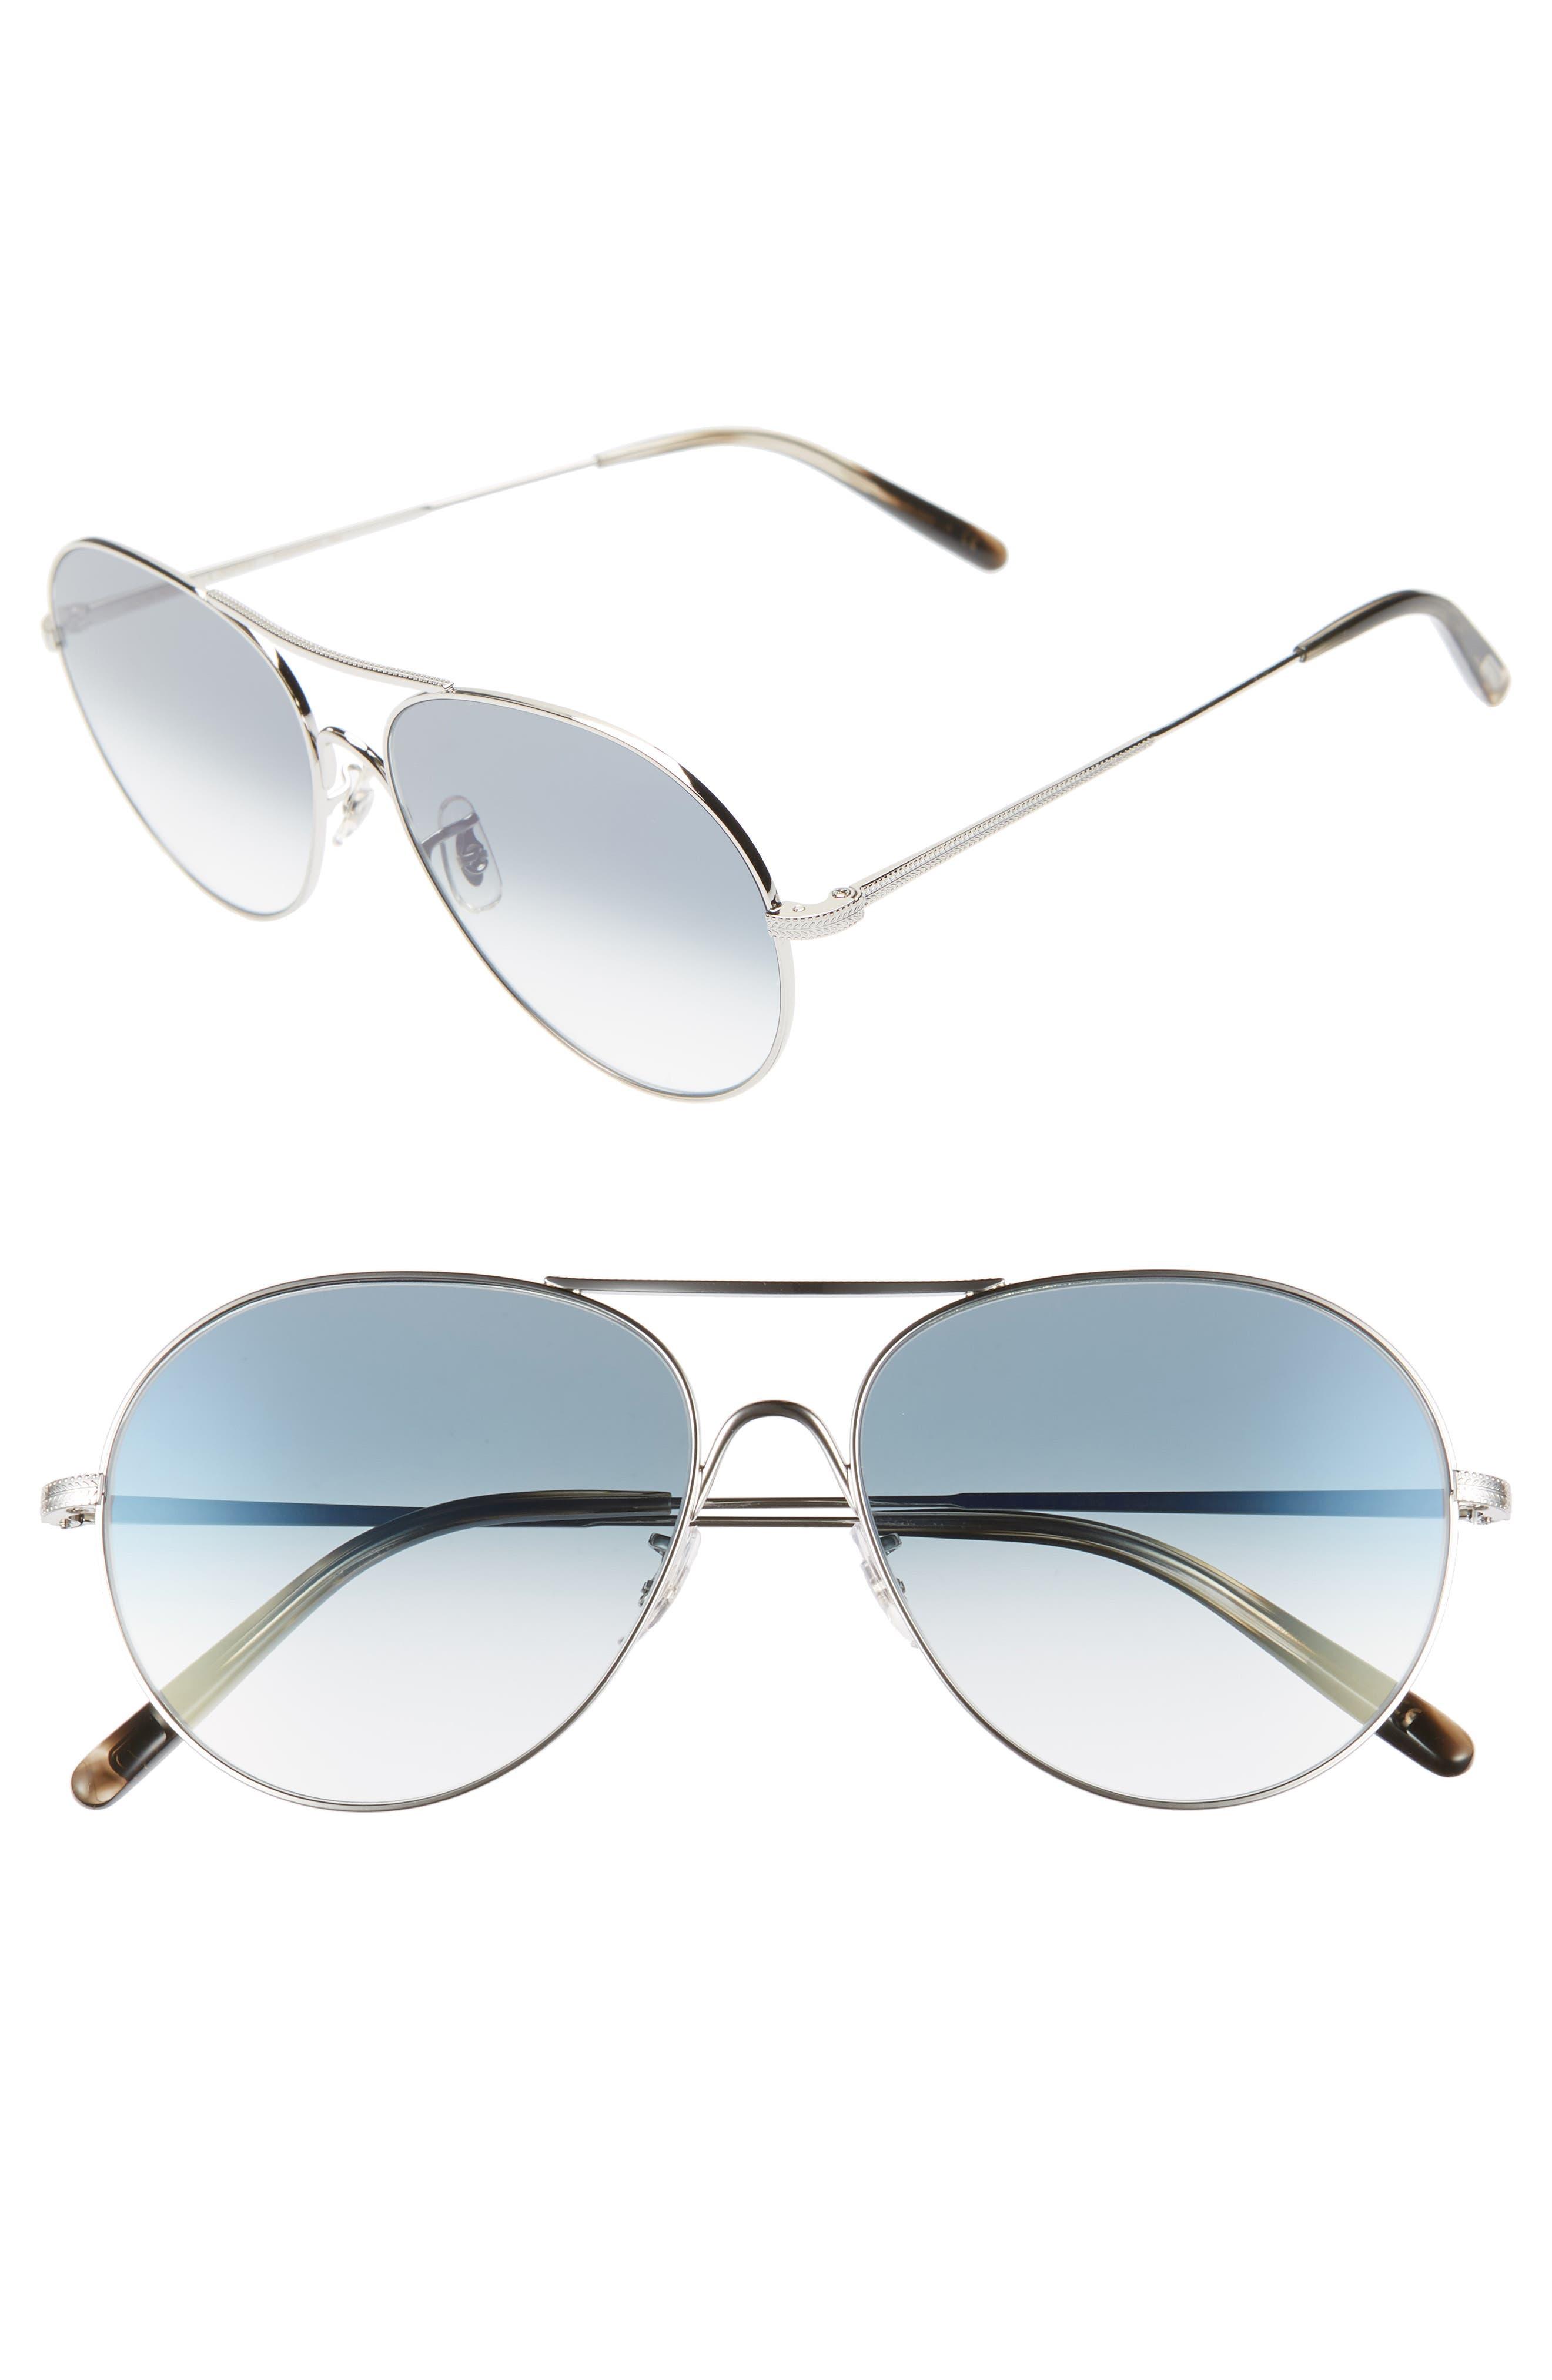 Rockmore 58Mm Photochromic Aviator Sunglasses - Chrome Sapphire